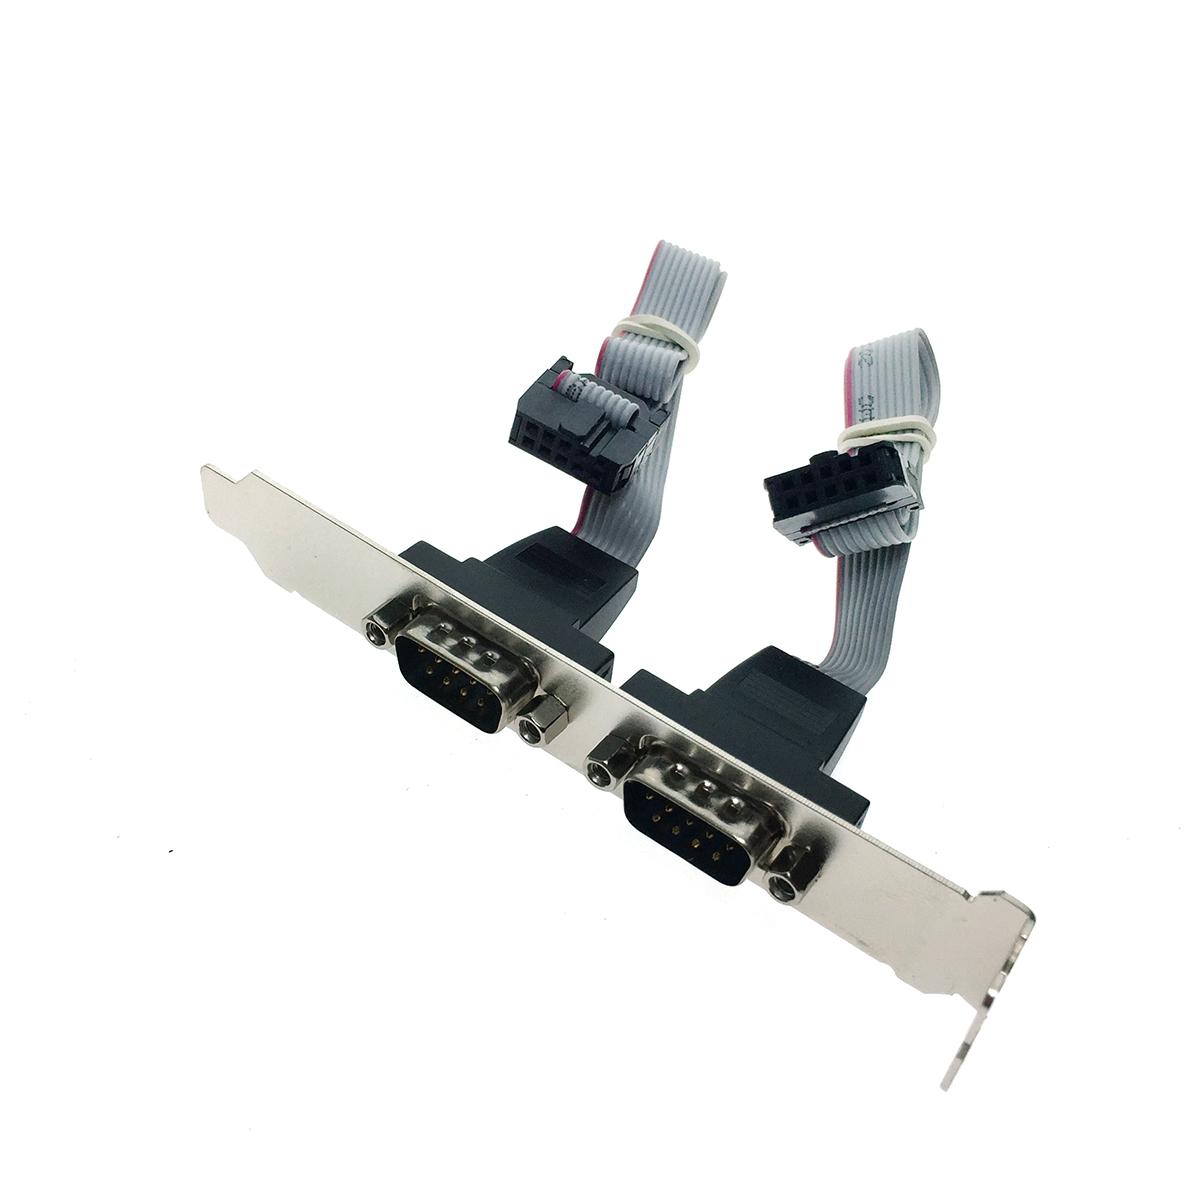 Монтажная планка с разъемами COM 2 порта Bracket RS-232 2 port, EBRCTkorpCOM-2p Espada